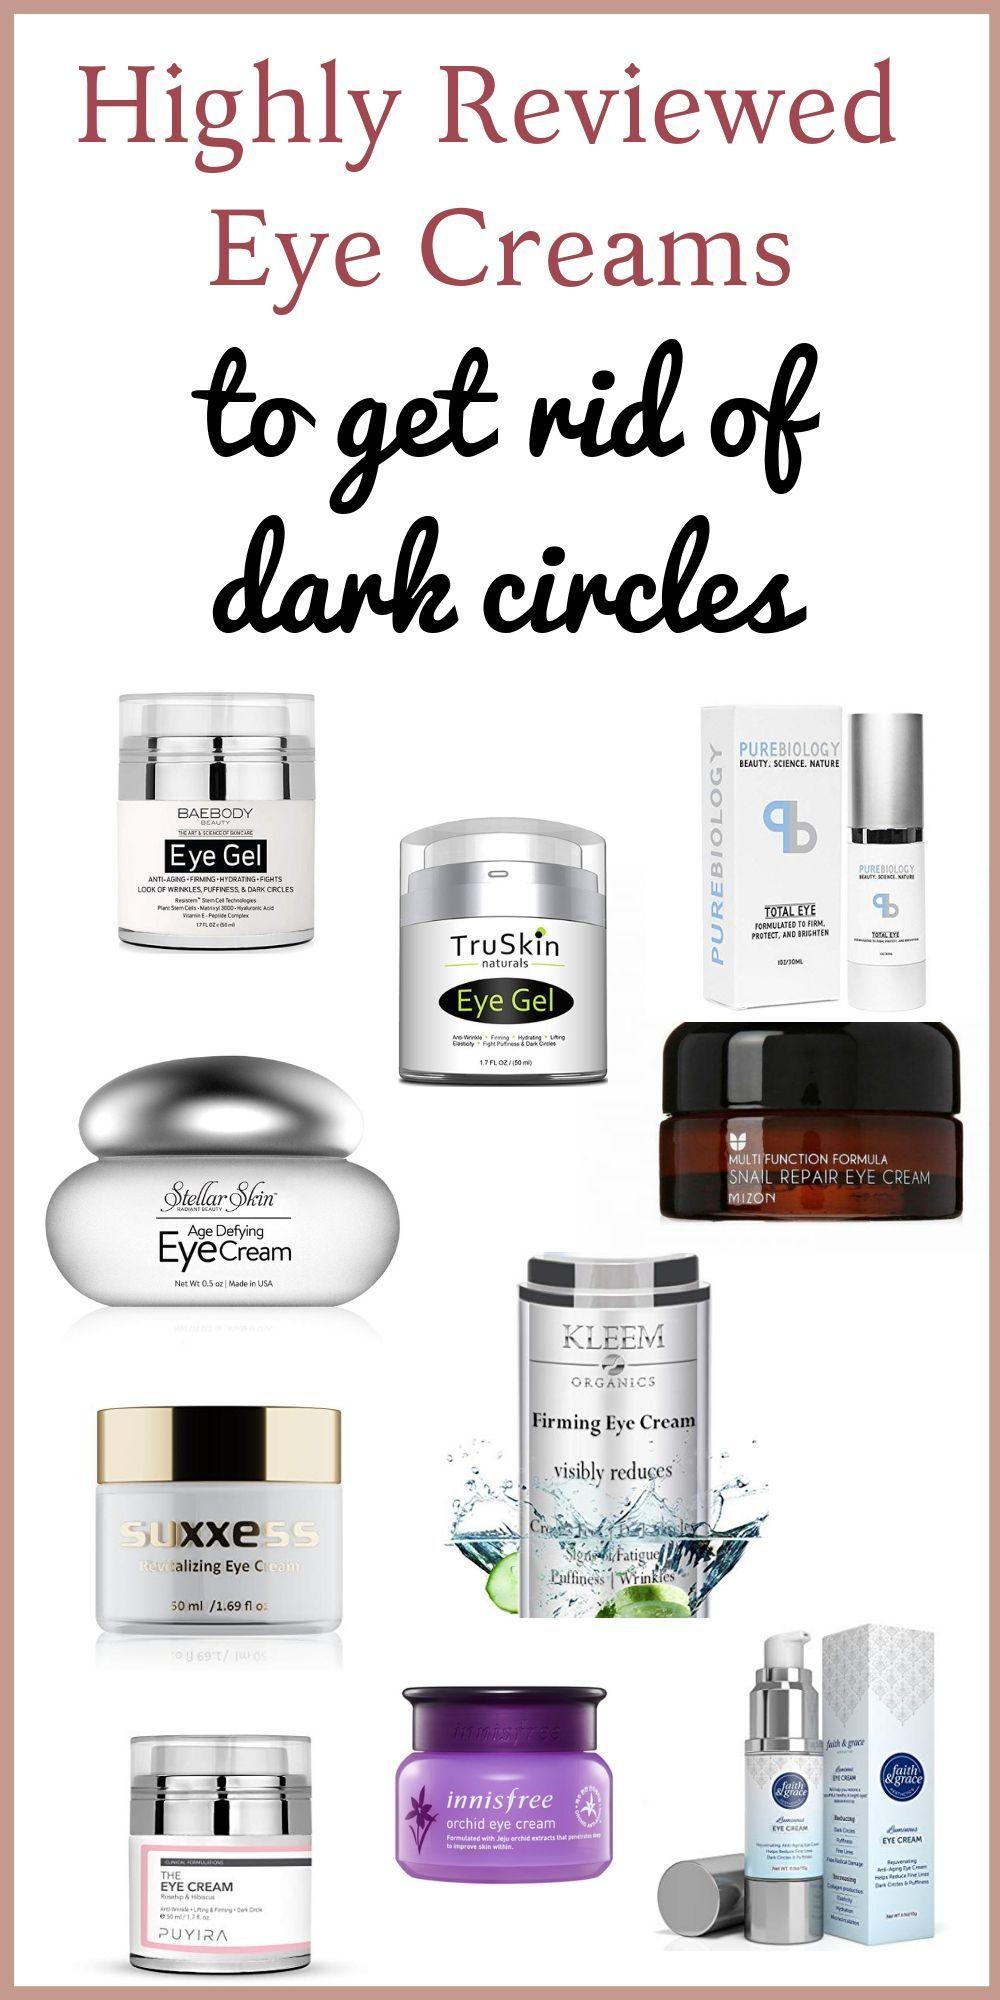 Best Korean Eye Creams For Dark Circles Wrinkles Puffiness Eye Cream For Dark Circles Korean Eye Cream Best Korean Eye Cream